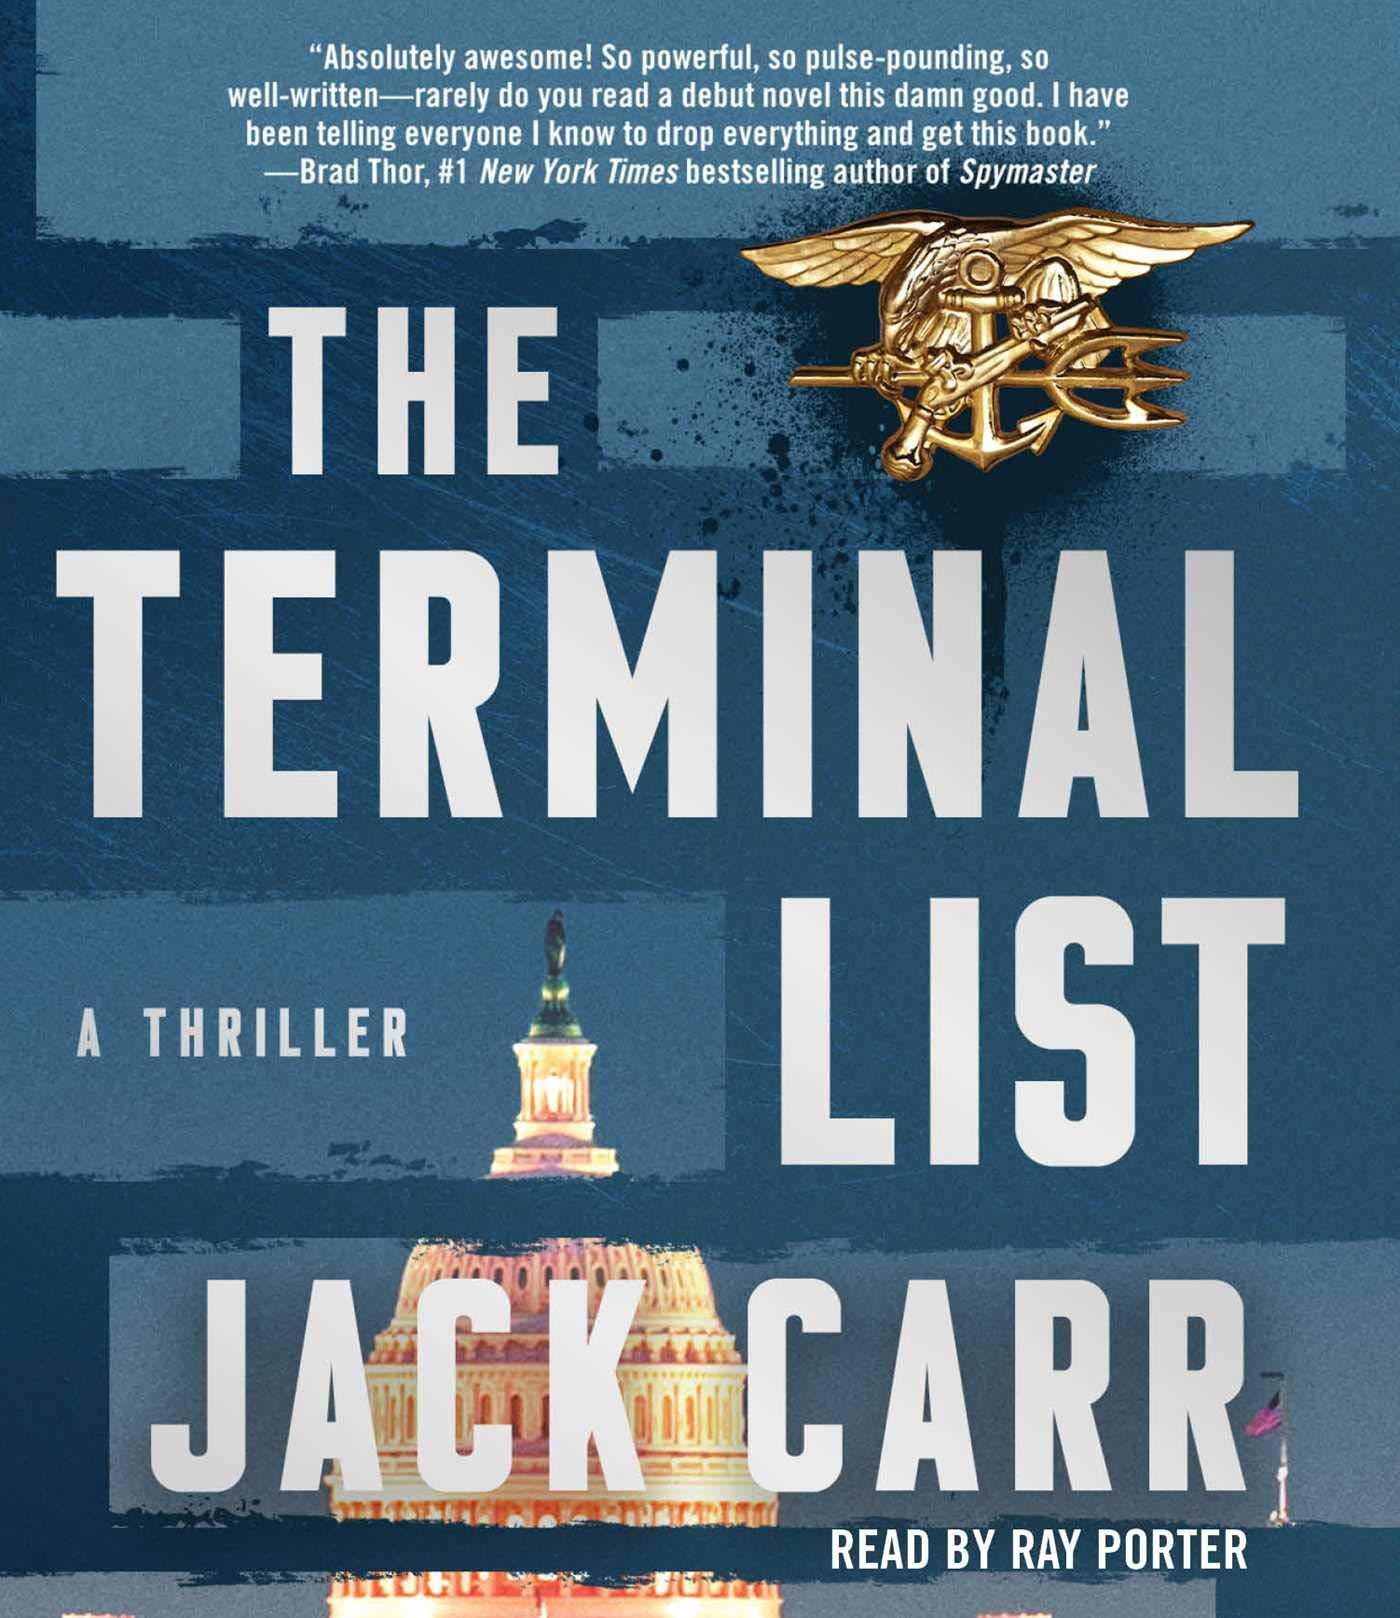 Amazon com: The Terminal List: A Thriller (1) (9781508268437